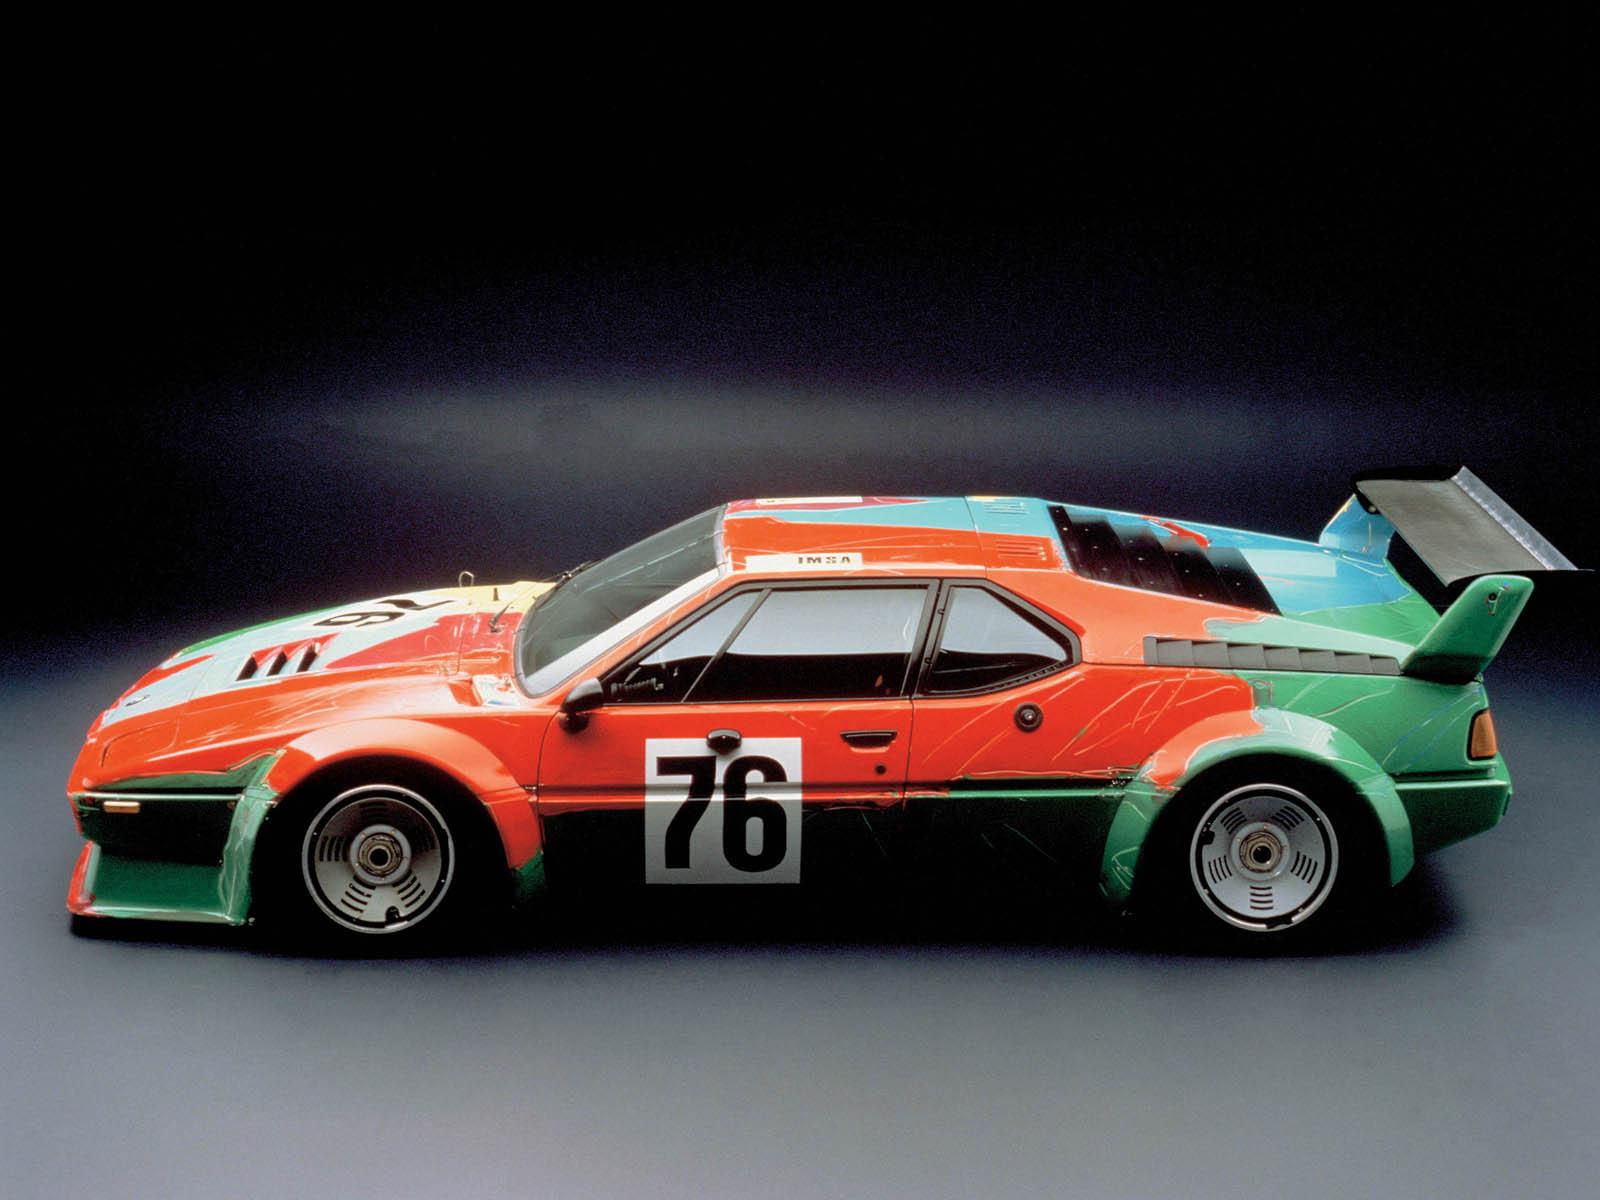 BMW M1 - 4-я машина из коллекции BMW Art cars